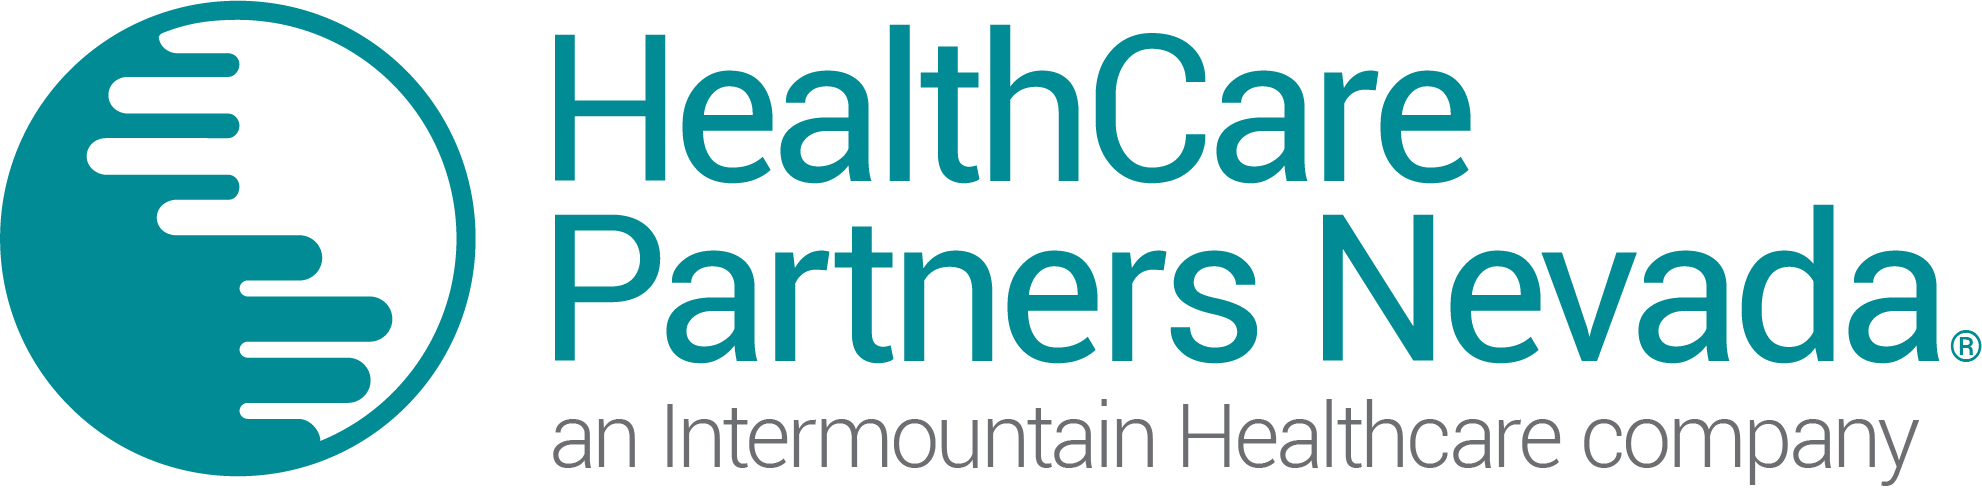 HealthCare Partners Nevada Logo